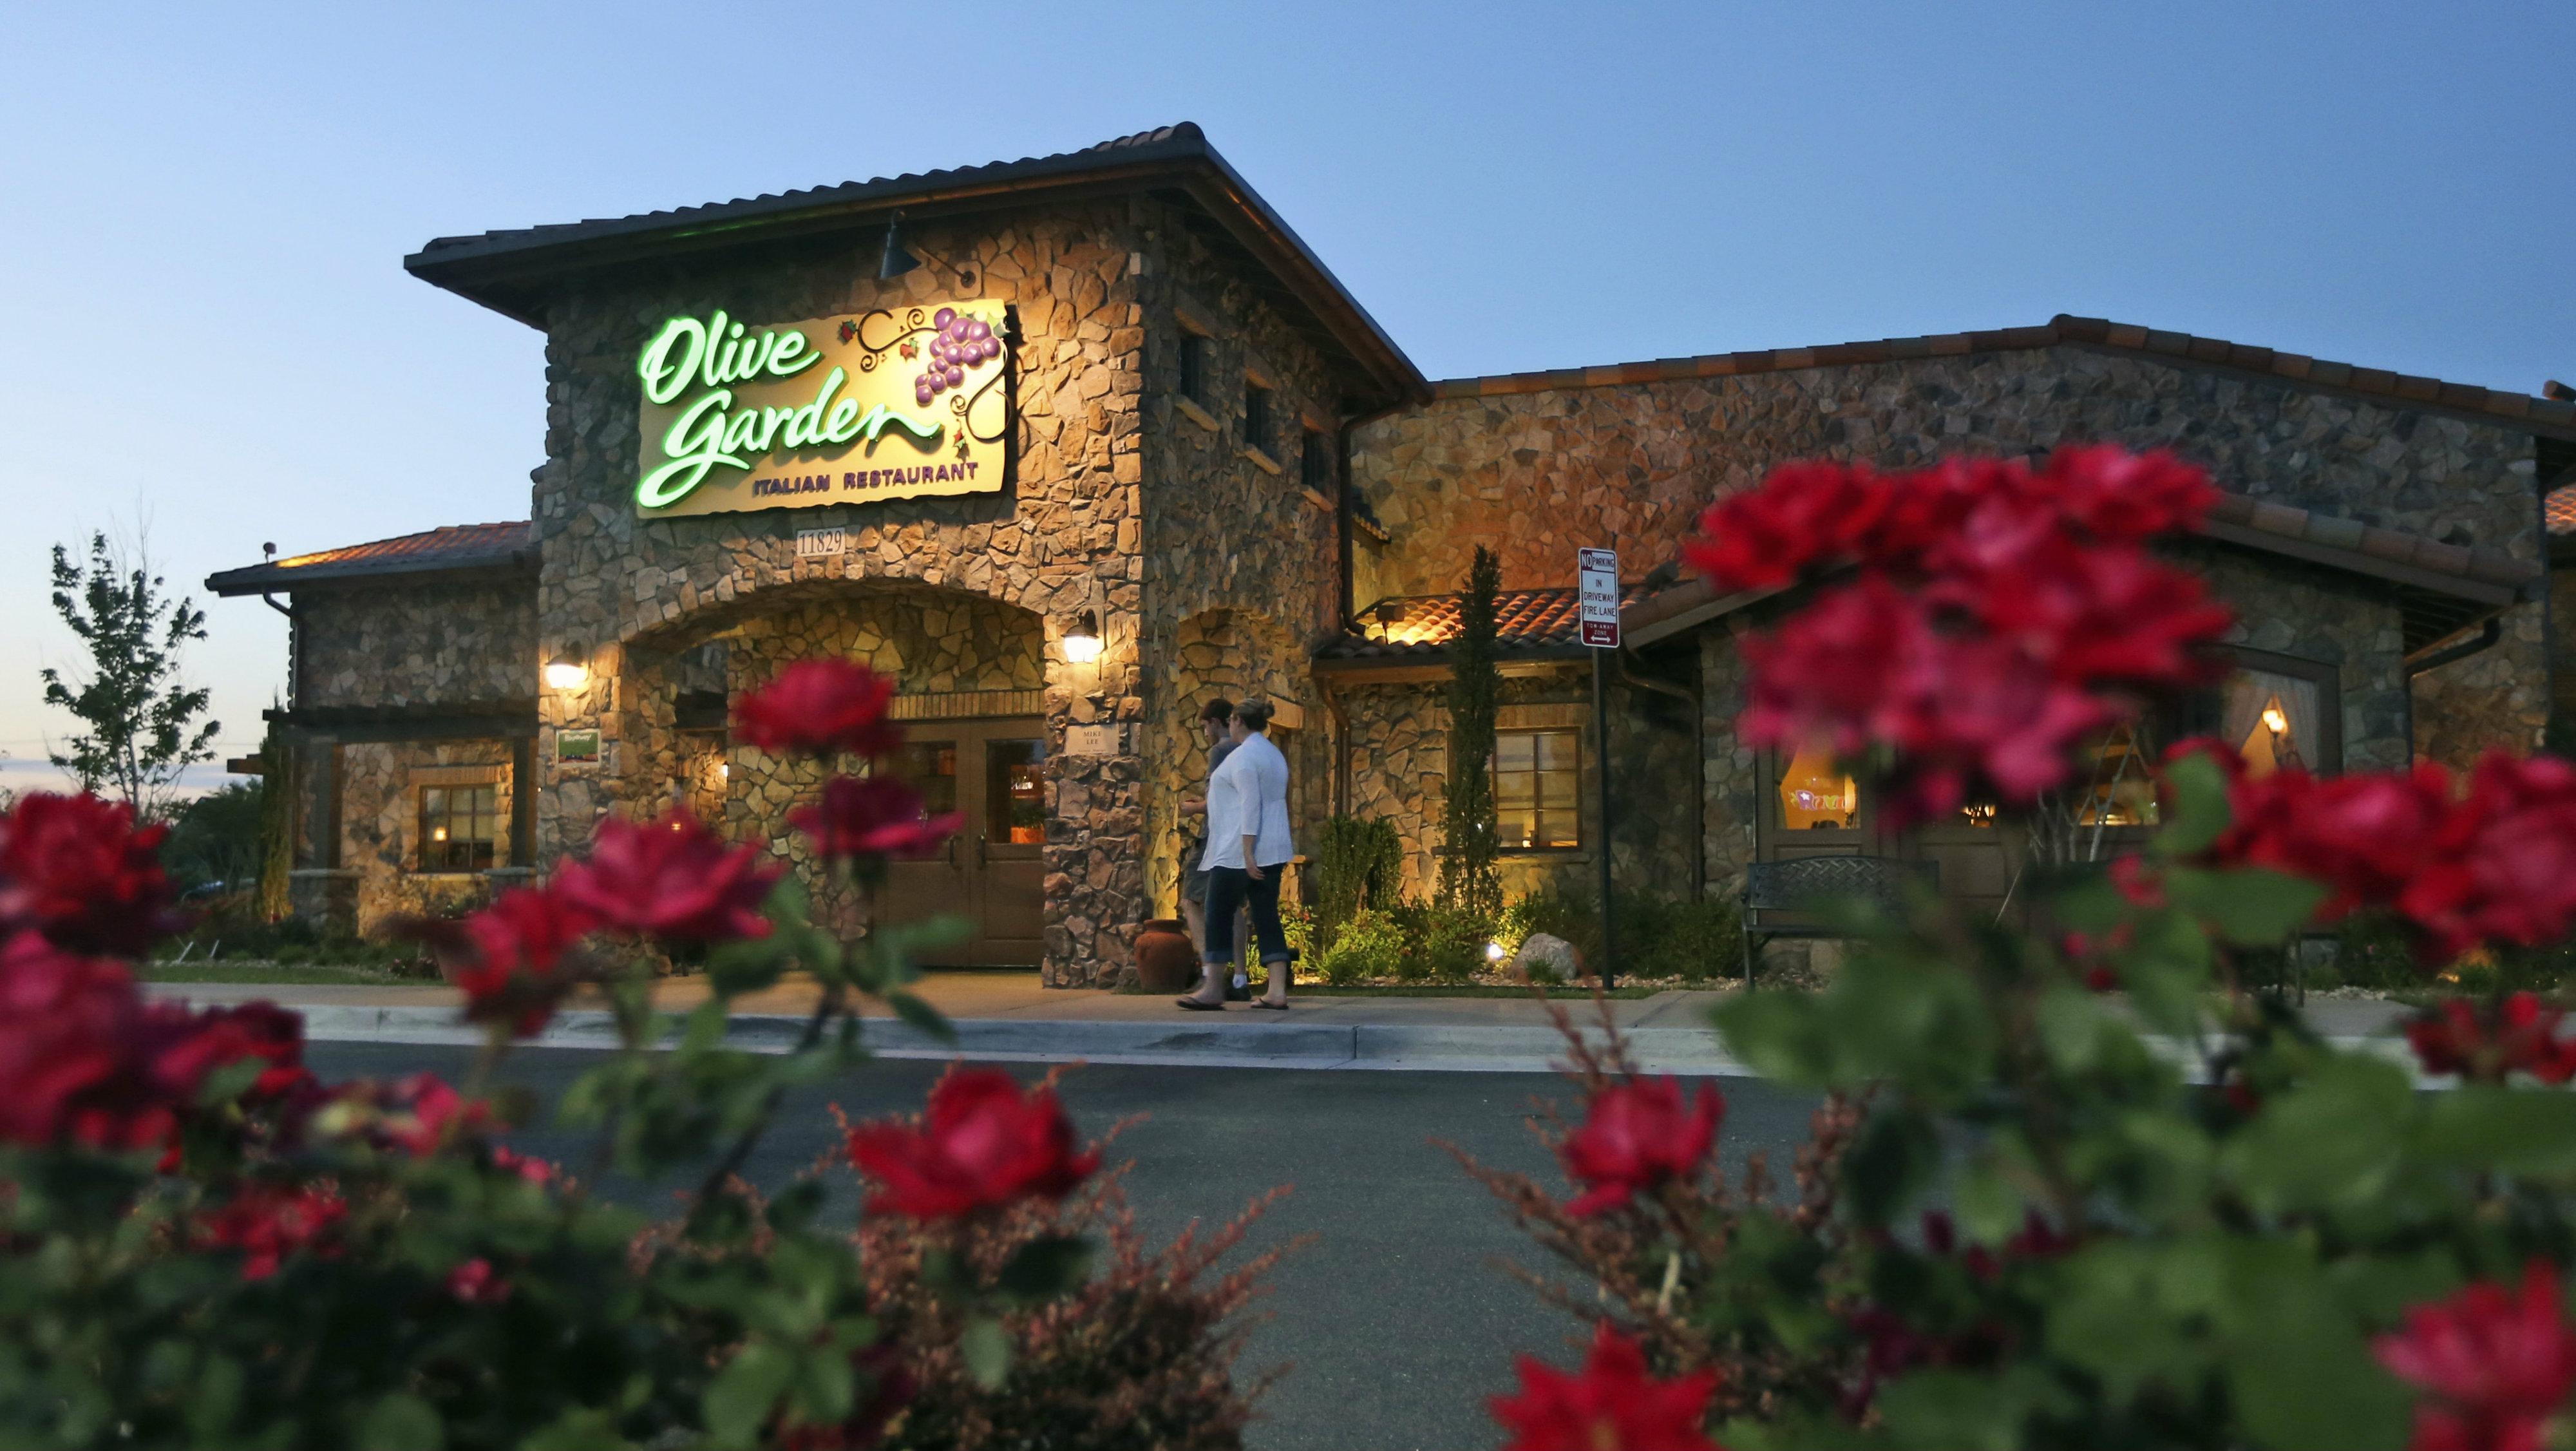 olive garden tipped minimum wage 2